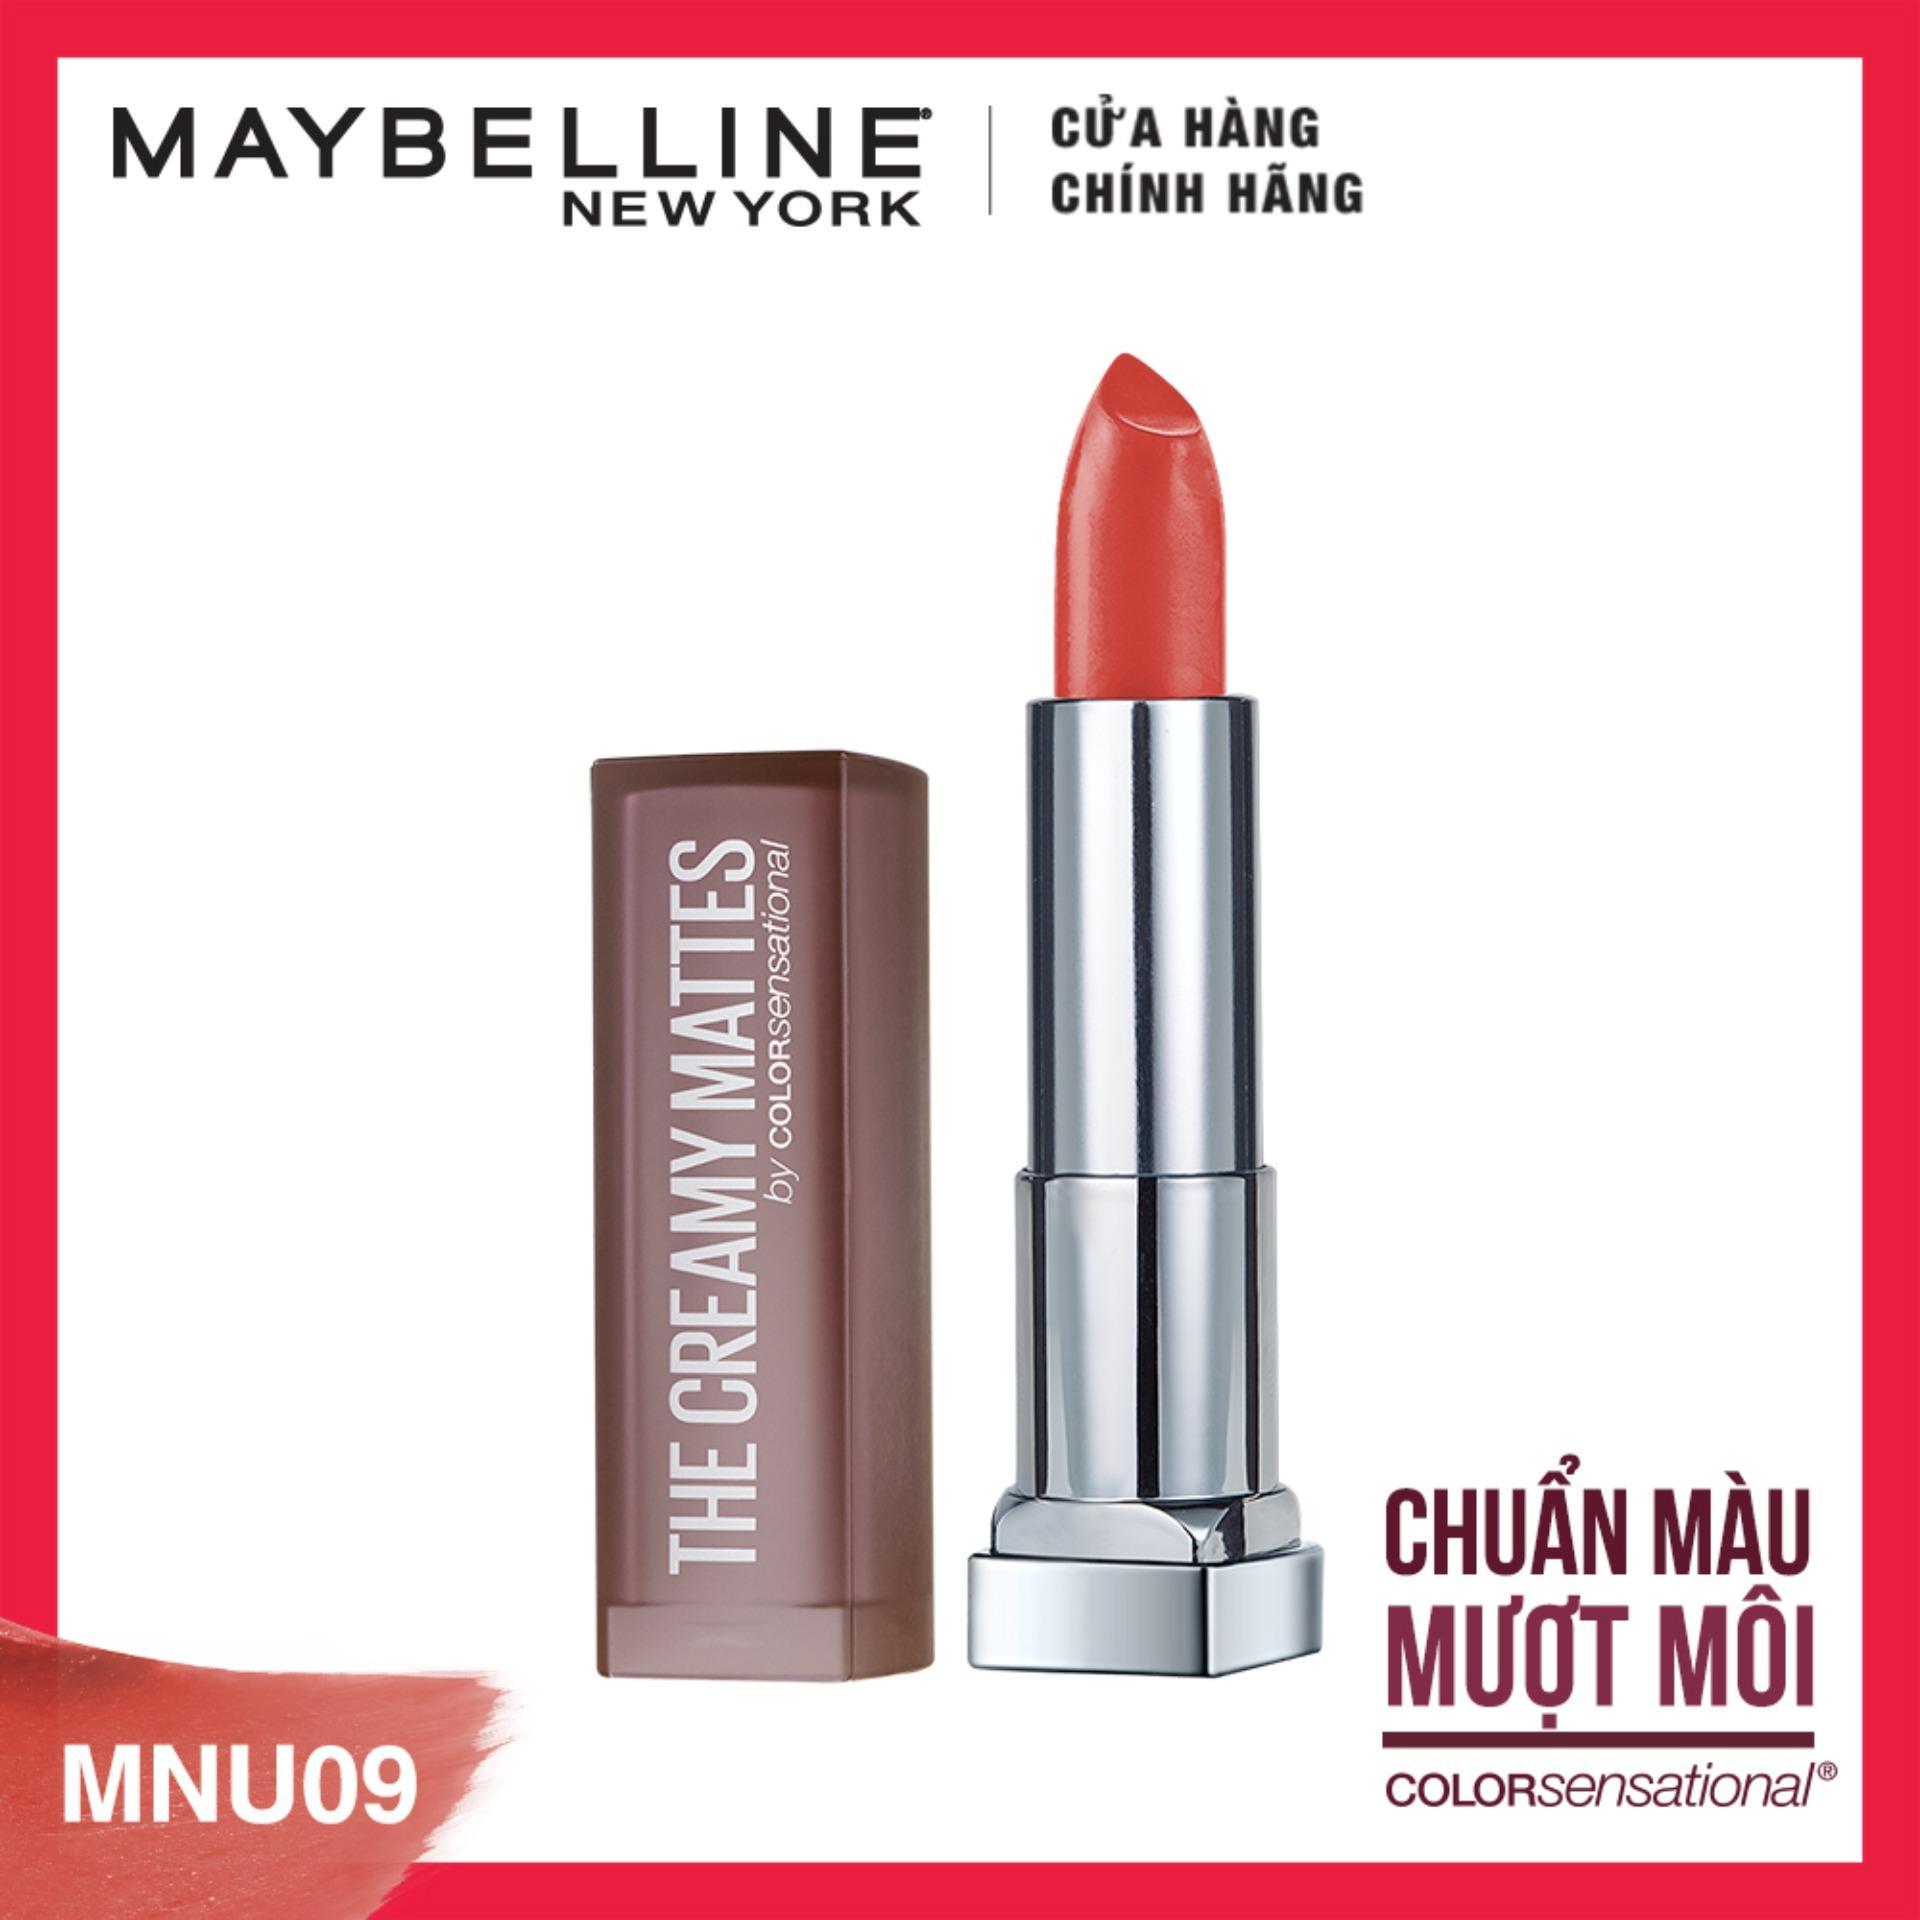 Son lì nịnh môi Maybelline New York Creamy Matte - Nude 09: Chili Nude nhập khẩu